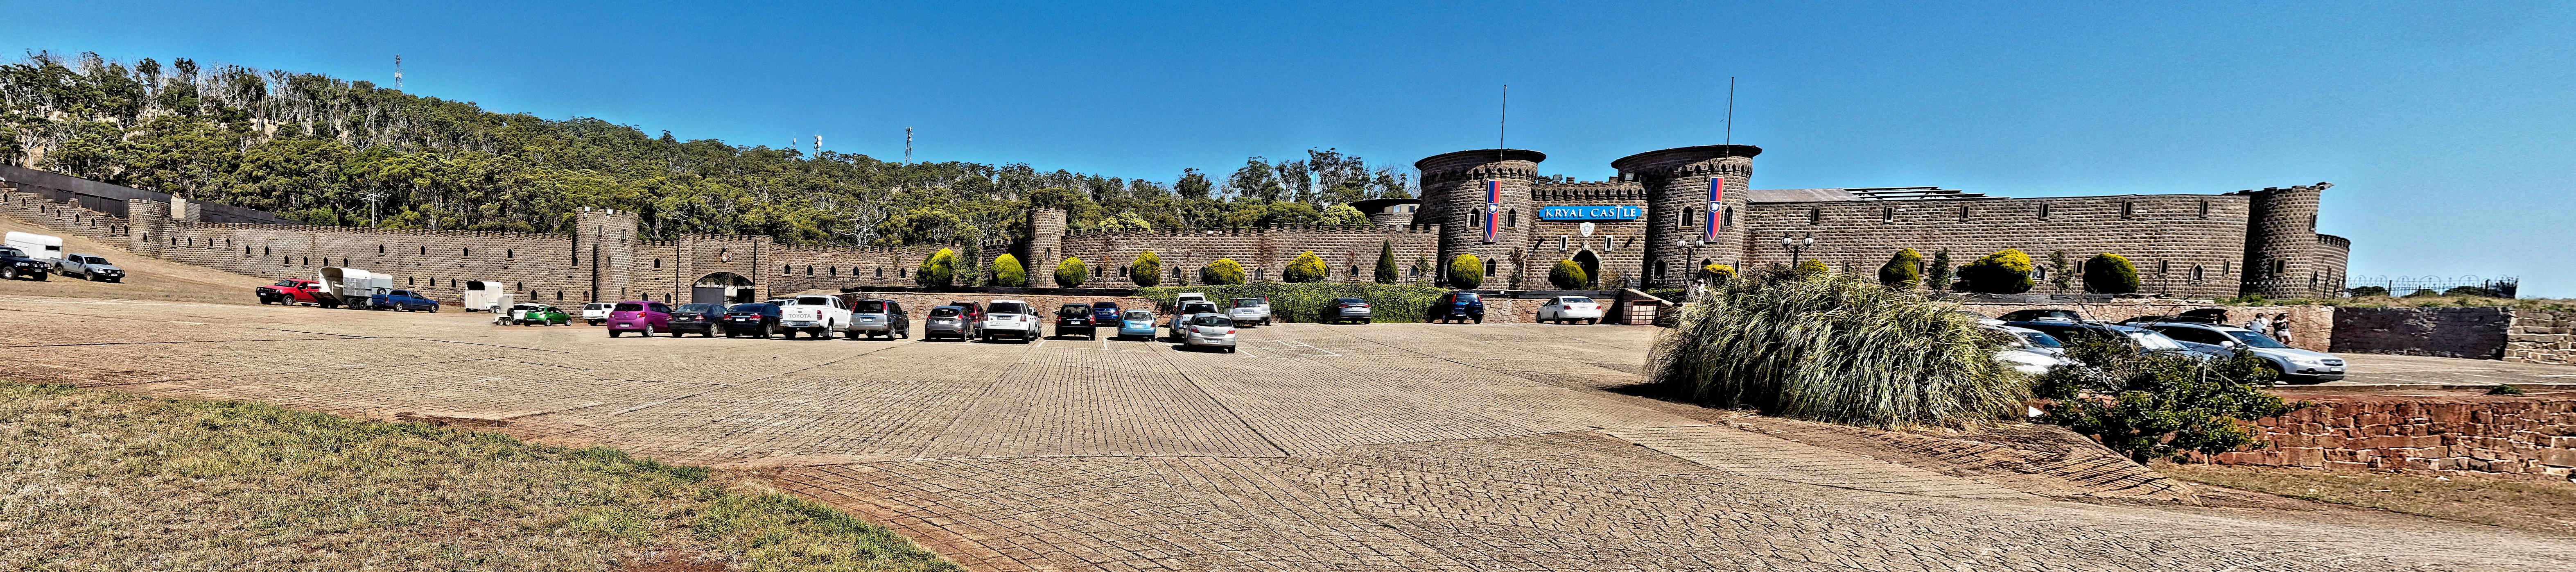 Kryal-castle-2.jpeg